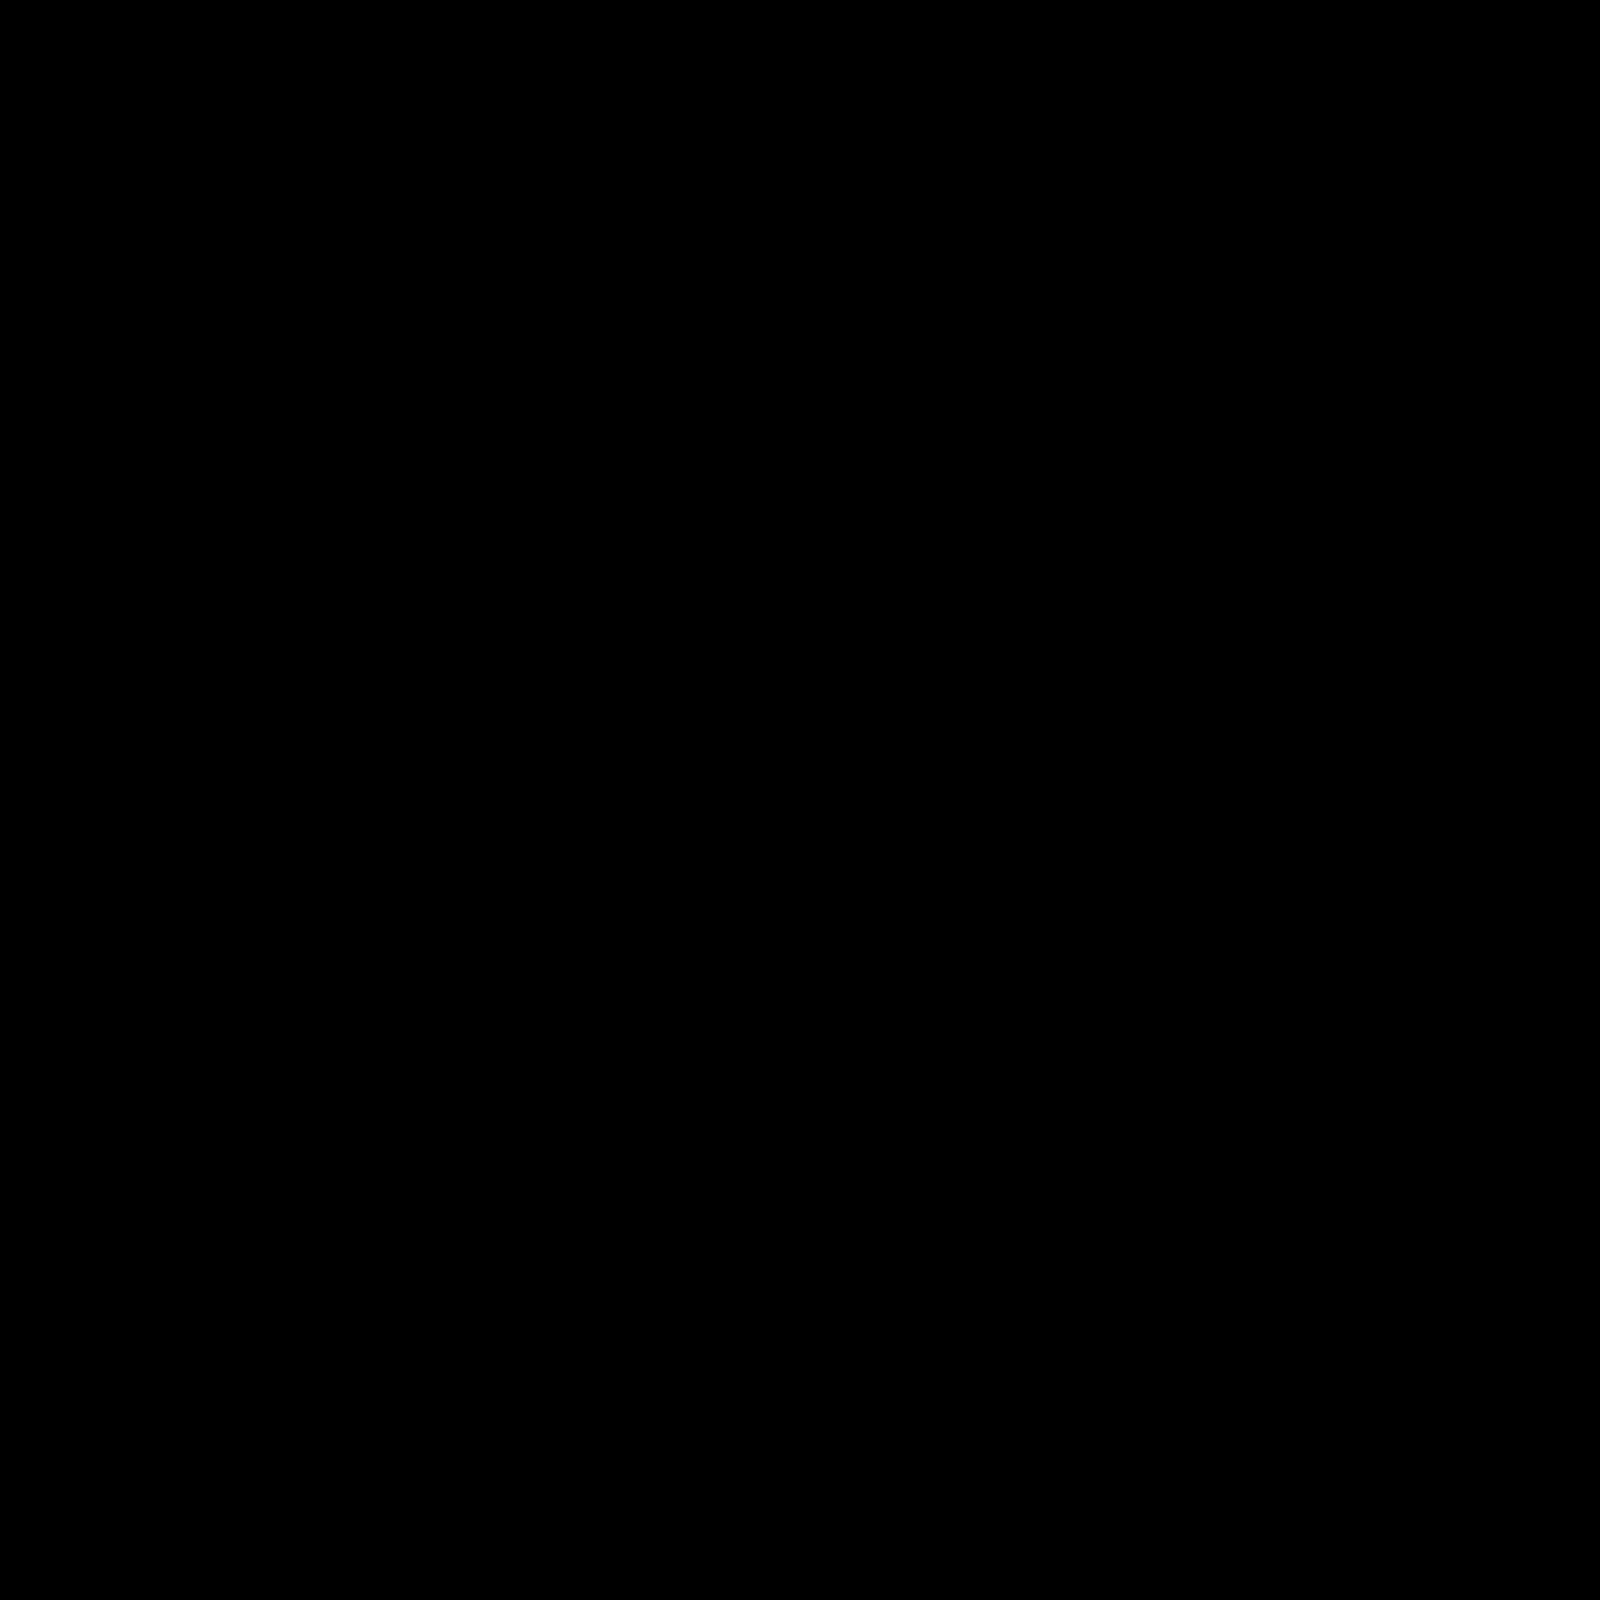 Logo Filled icon